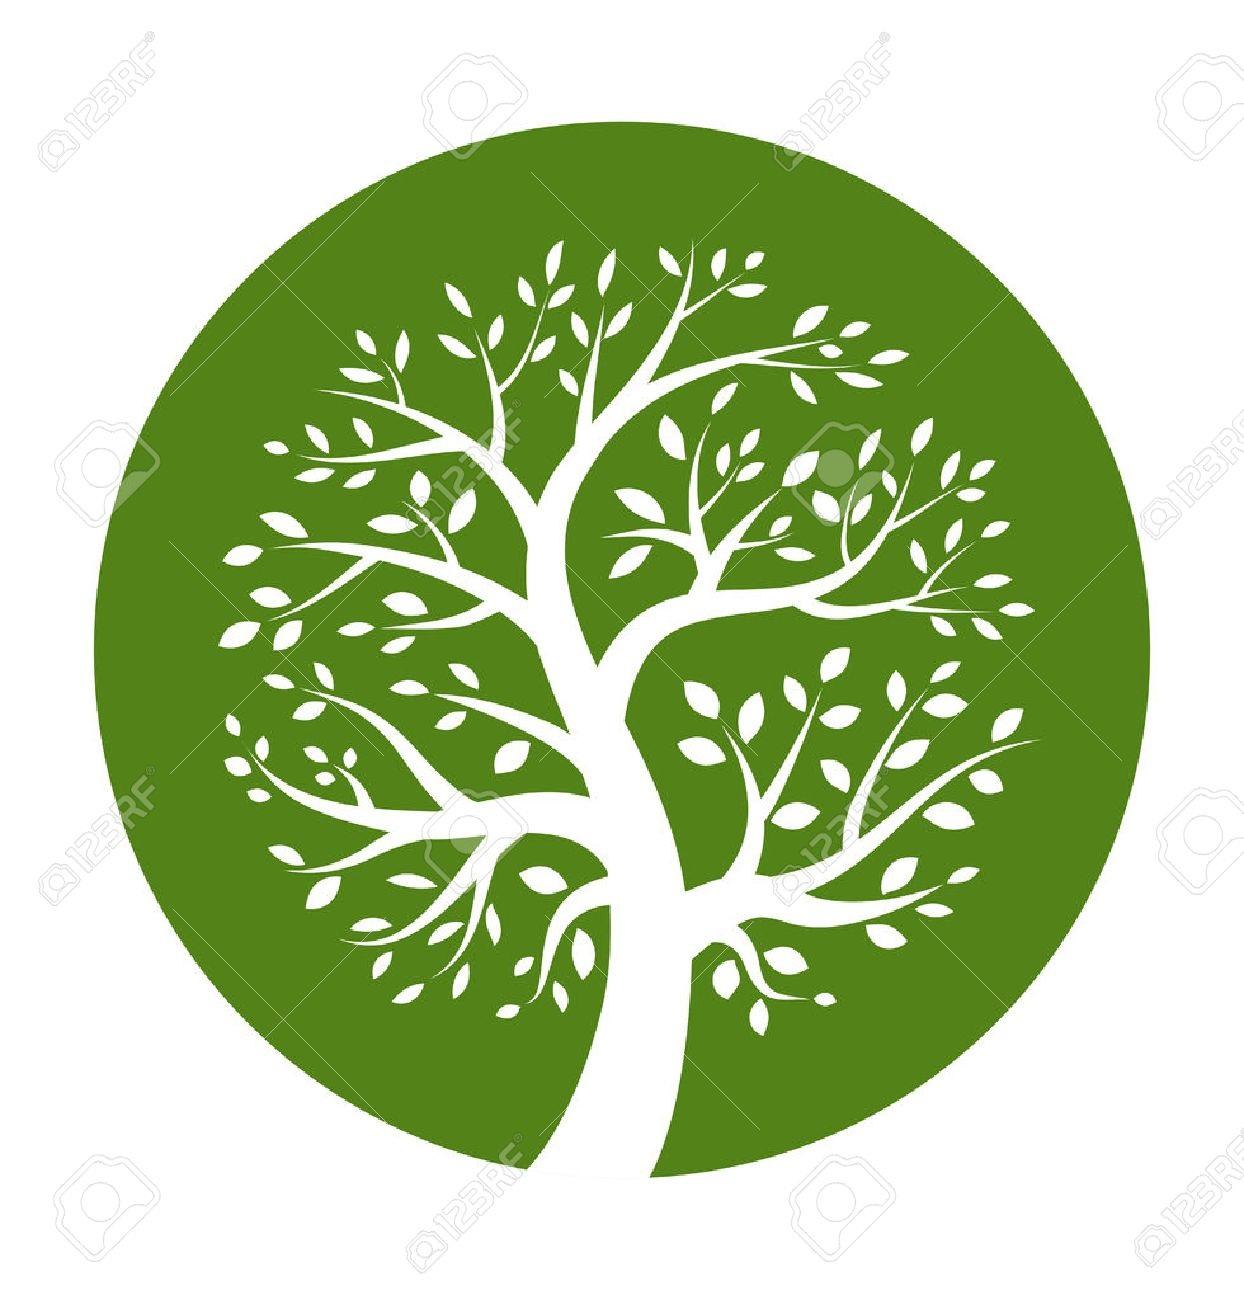 25433325-white-tree-icon-in-green-round